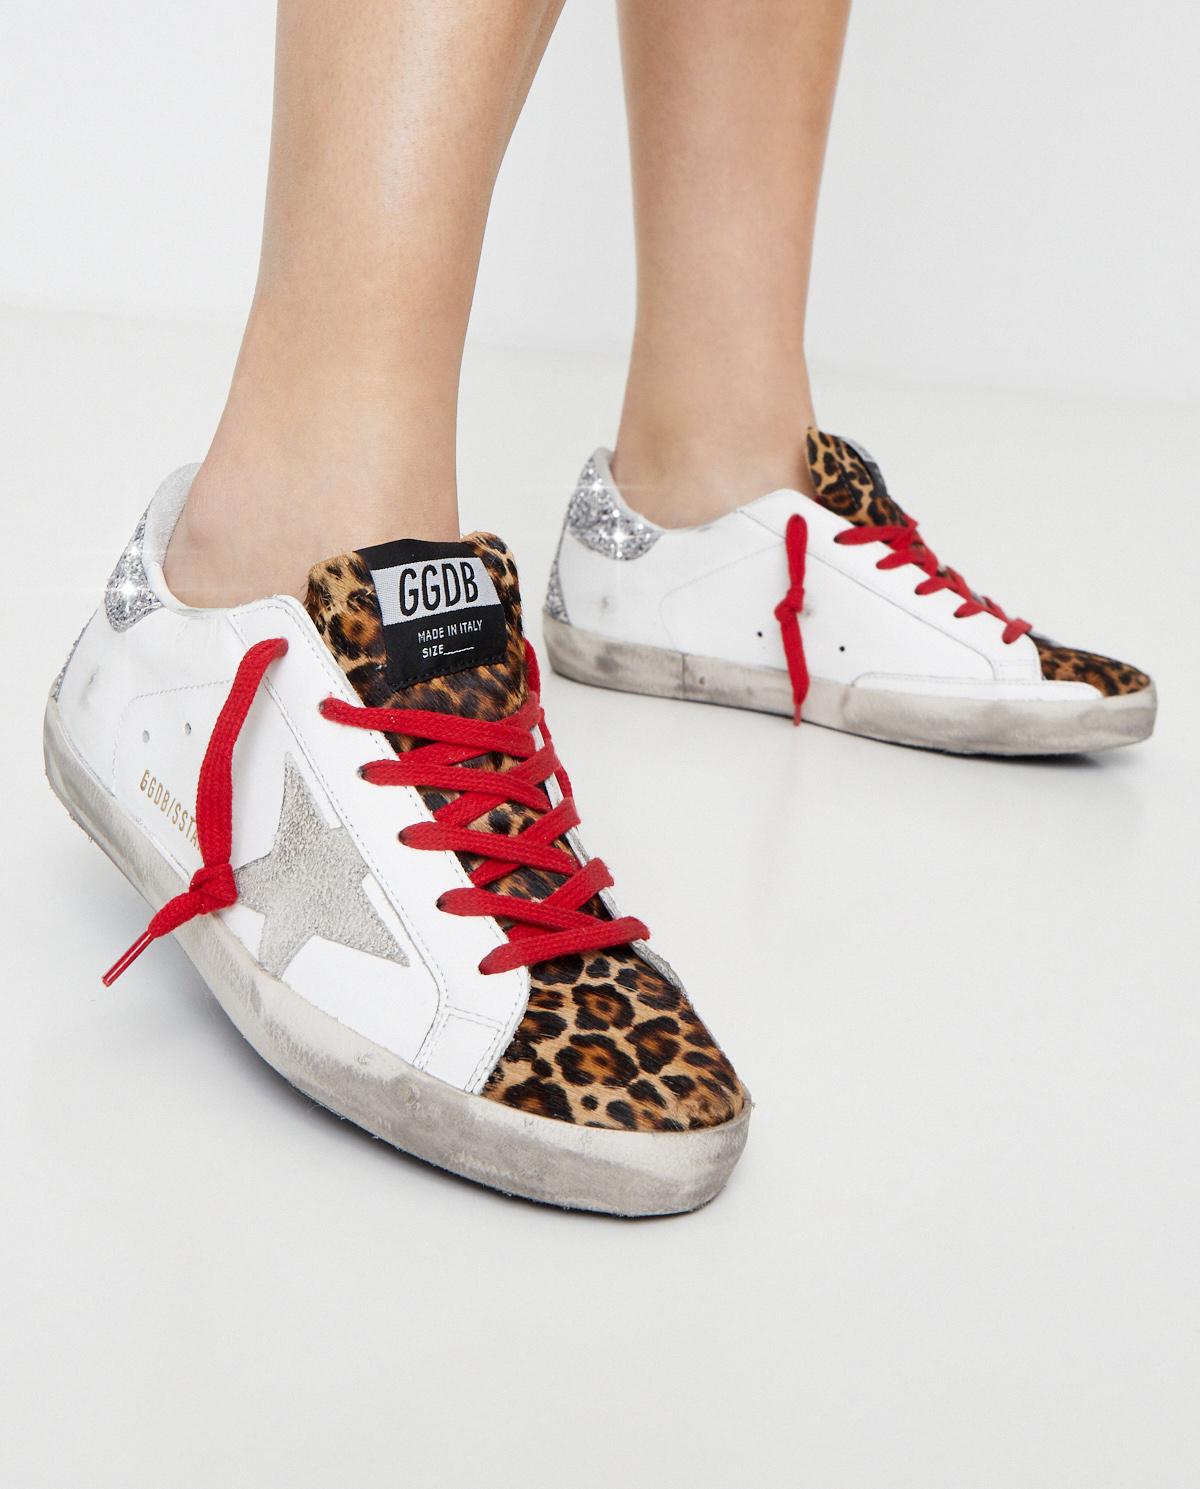 Sneakersy Superstar z brokatową piętą Golden Goose GWF00102 80244